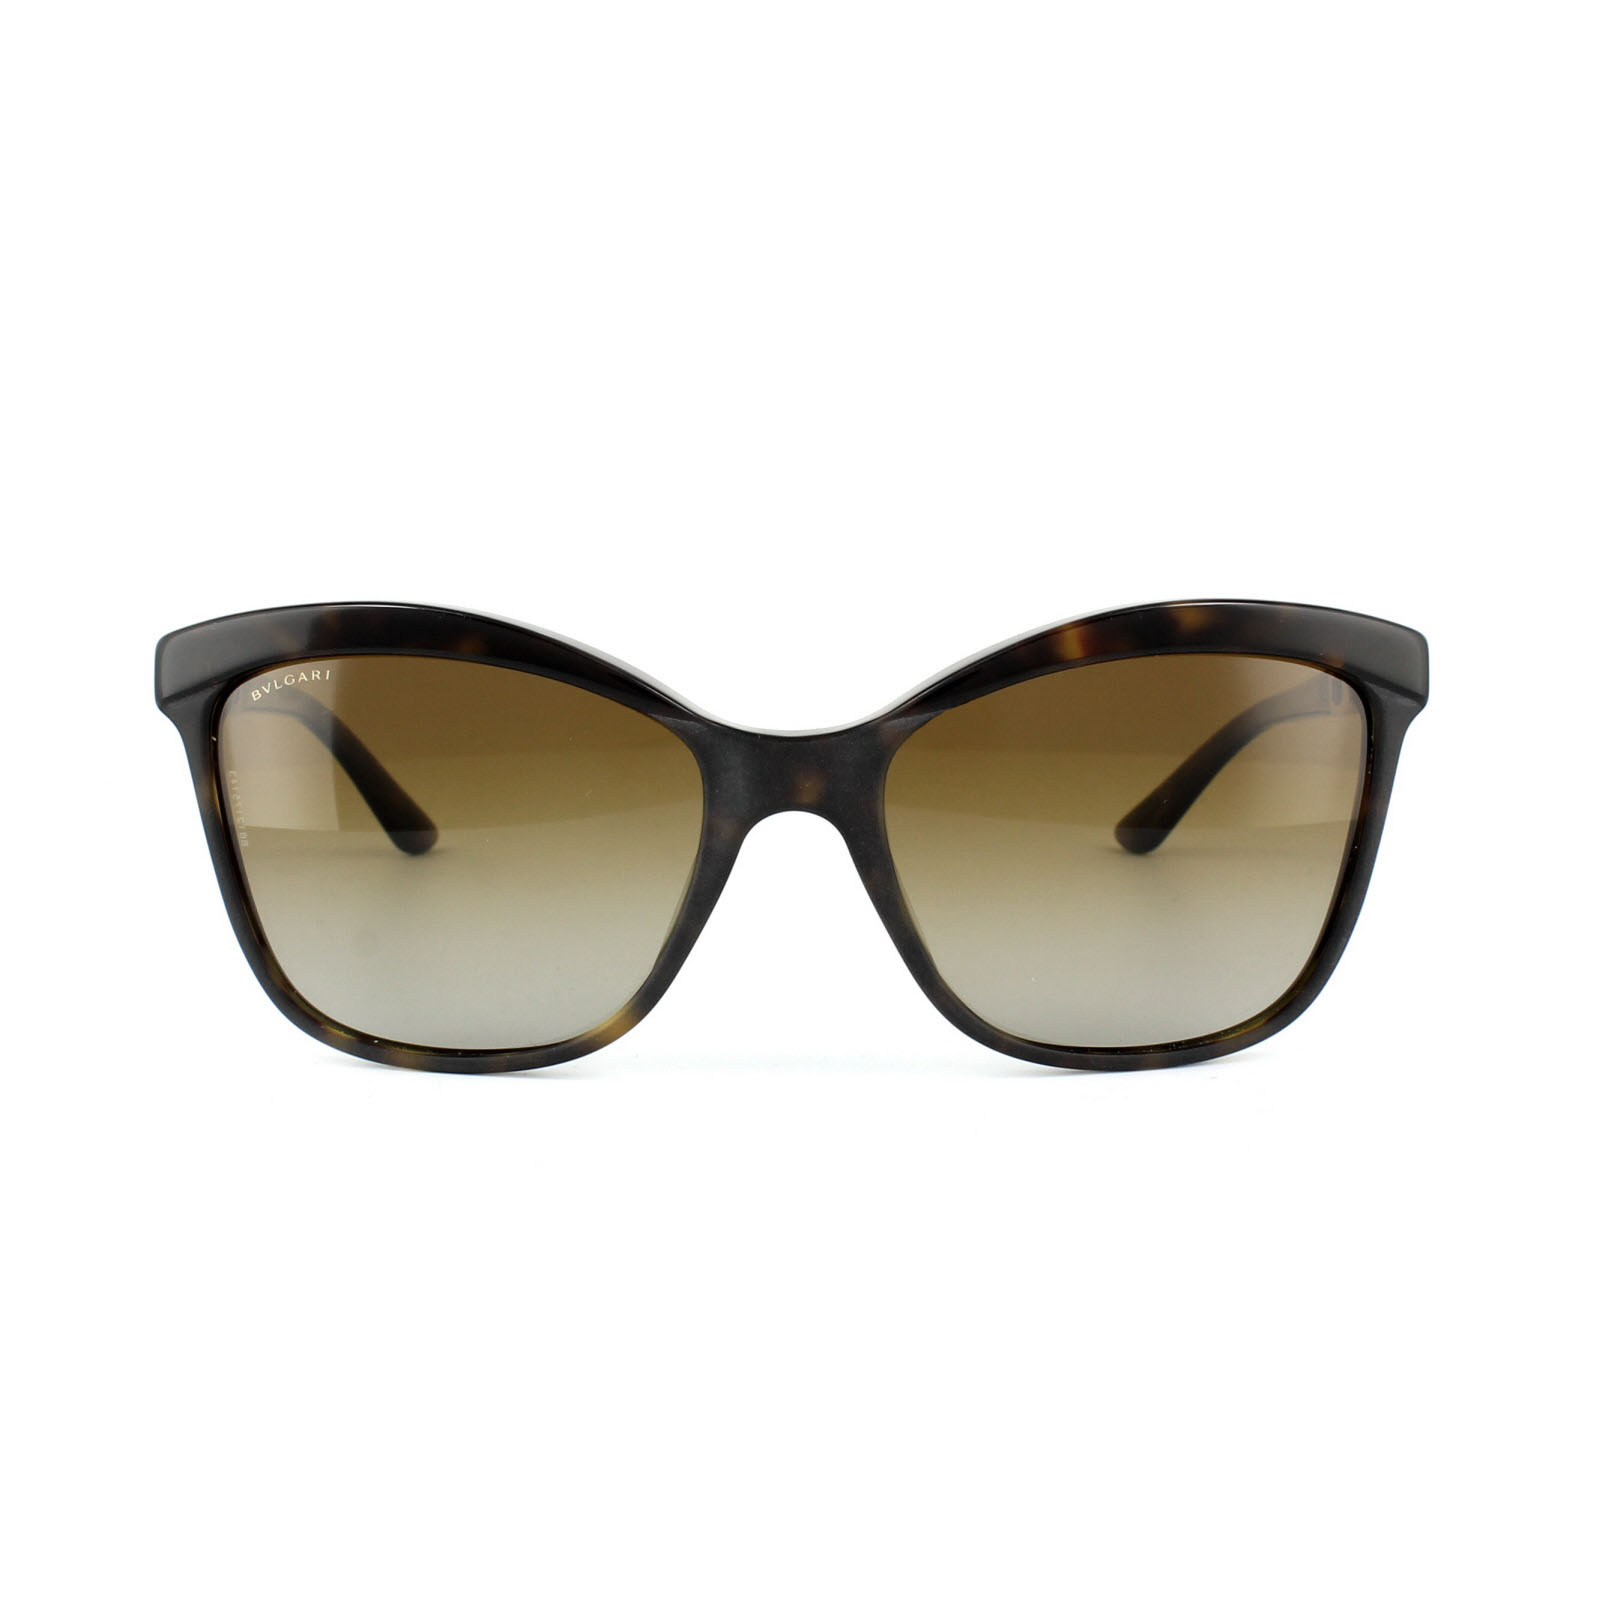 85188bd2216f Bvlgari 8163B Sunglasses Thumbnail 1 Bvlgari 8163B Sunglasses Thumbnail 2  ...